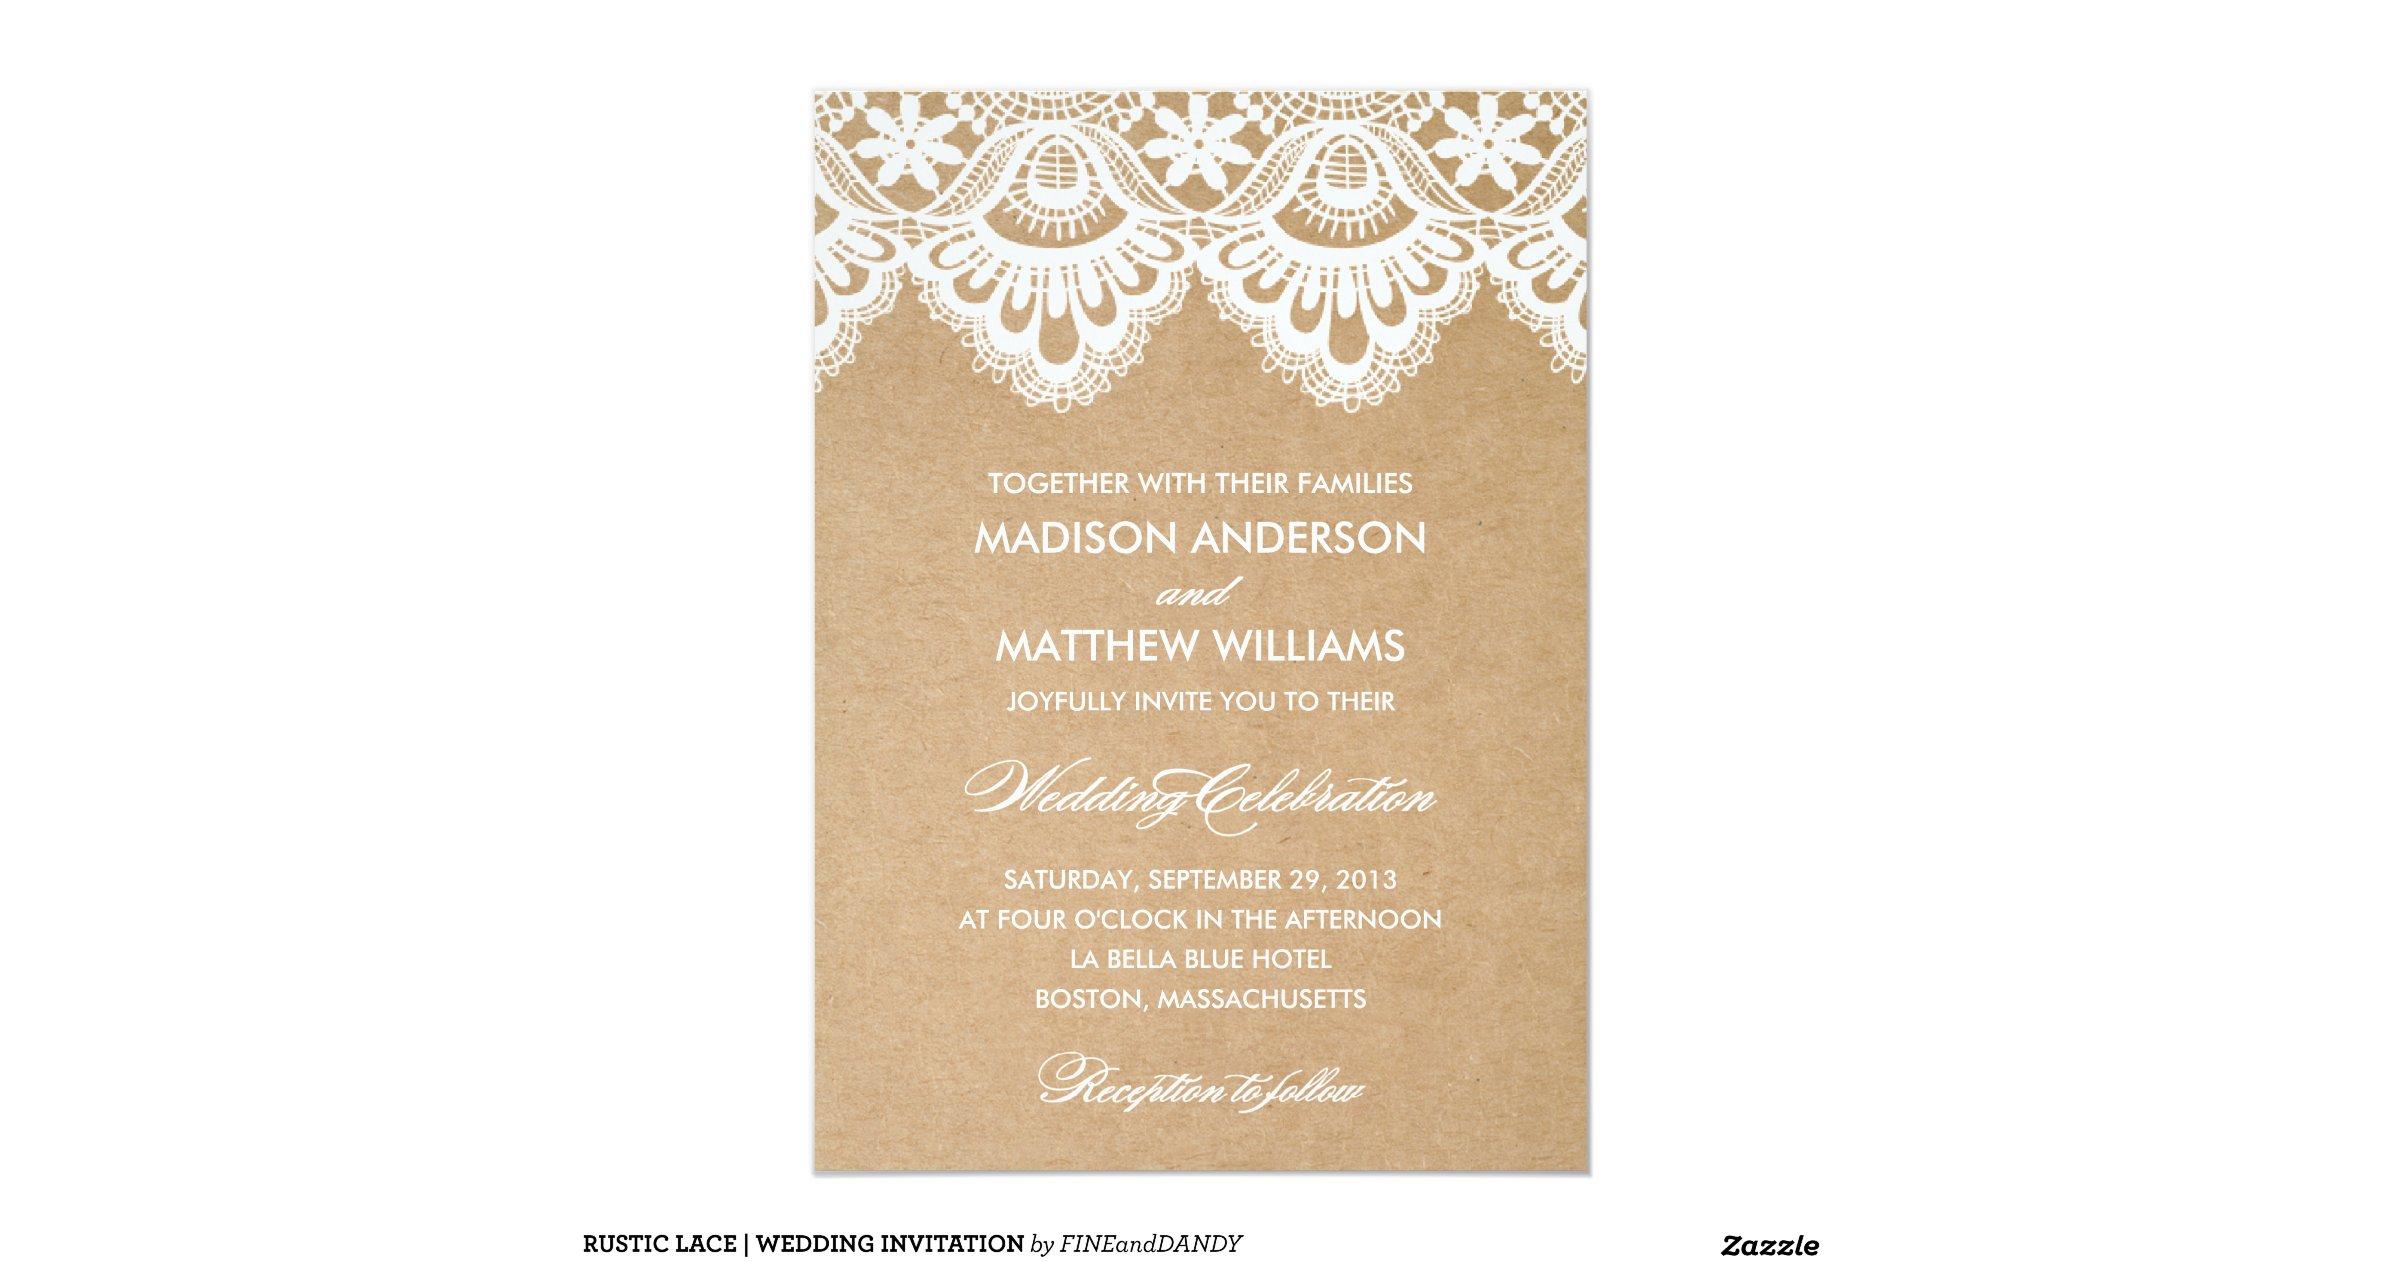 Rustic Wedding Reception Invitations: Rustic_lace_wedding_invitation